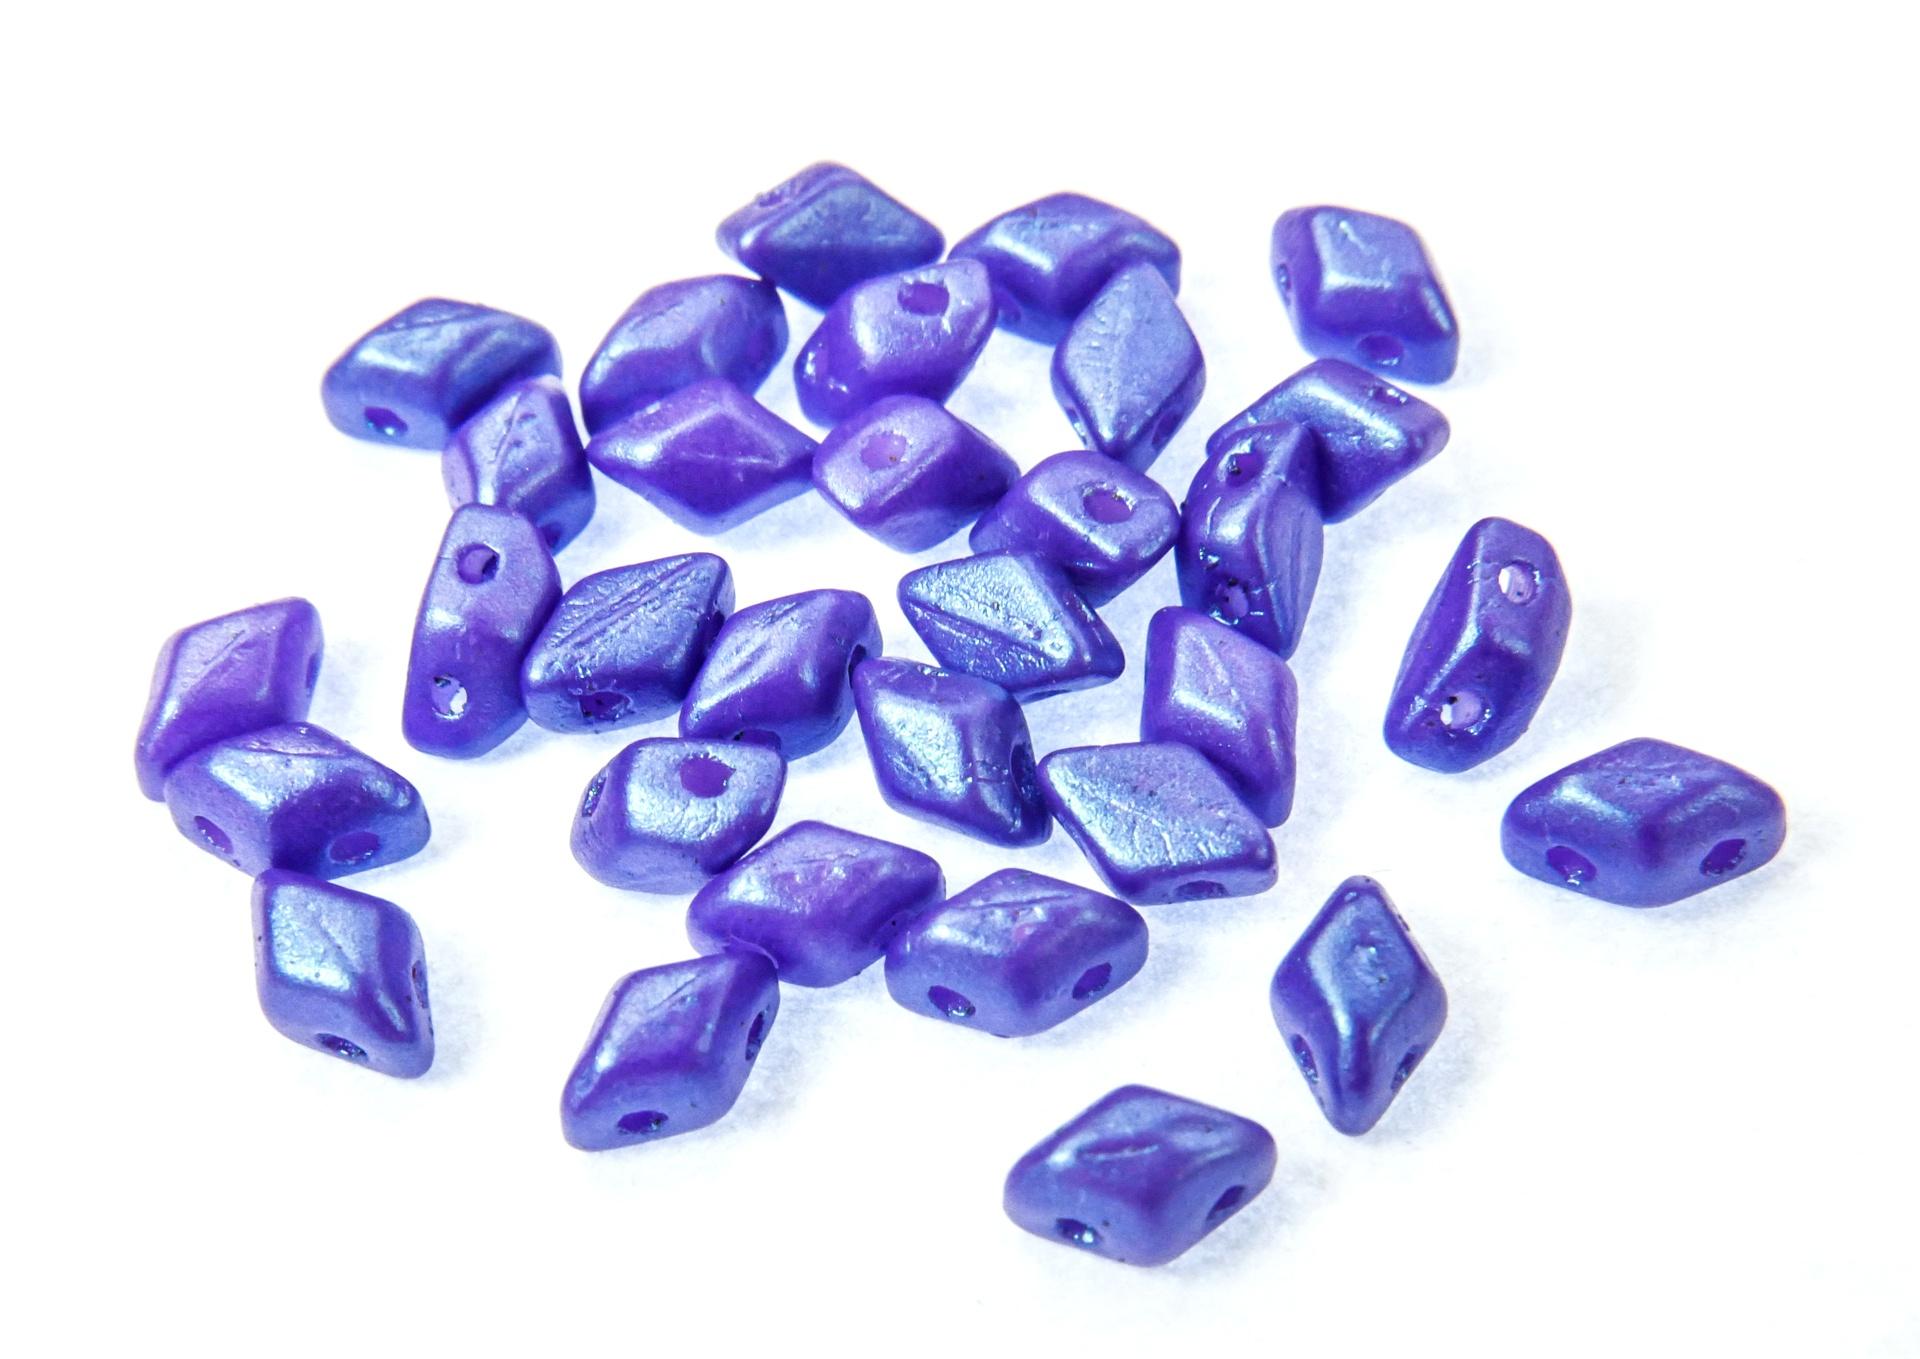 Czech Pressed Glass Beads / Mini GemDuo Beads